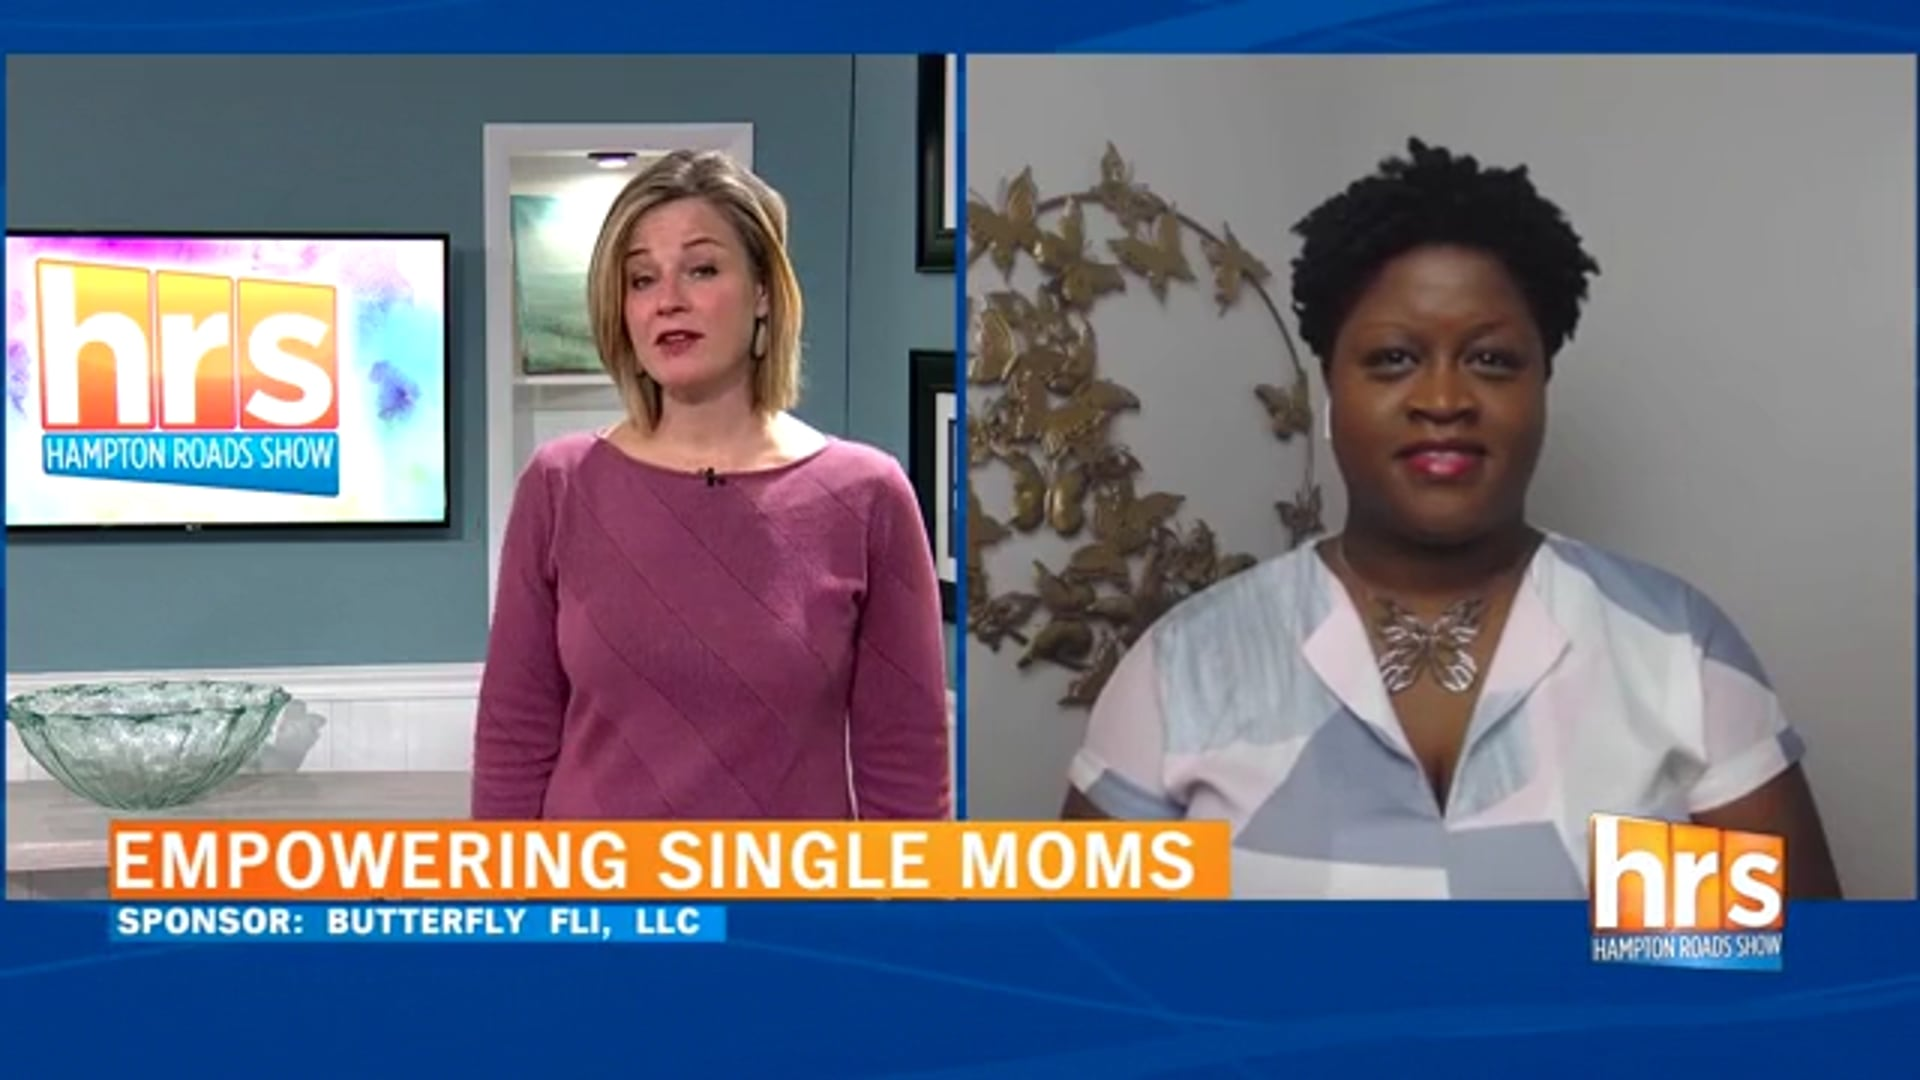 Helping Single Moms Find Their Wings